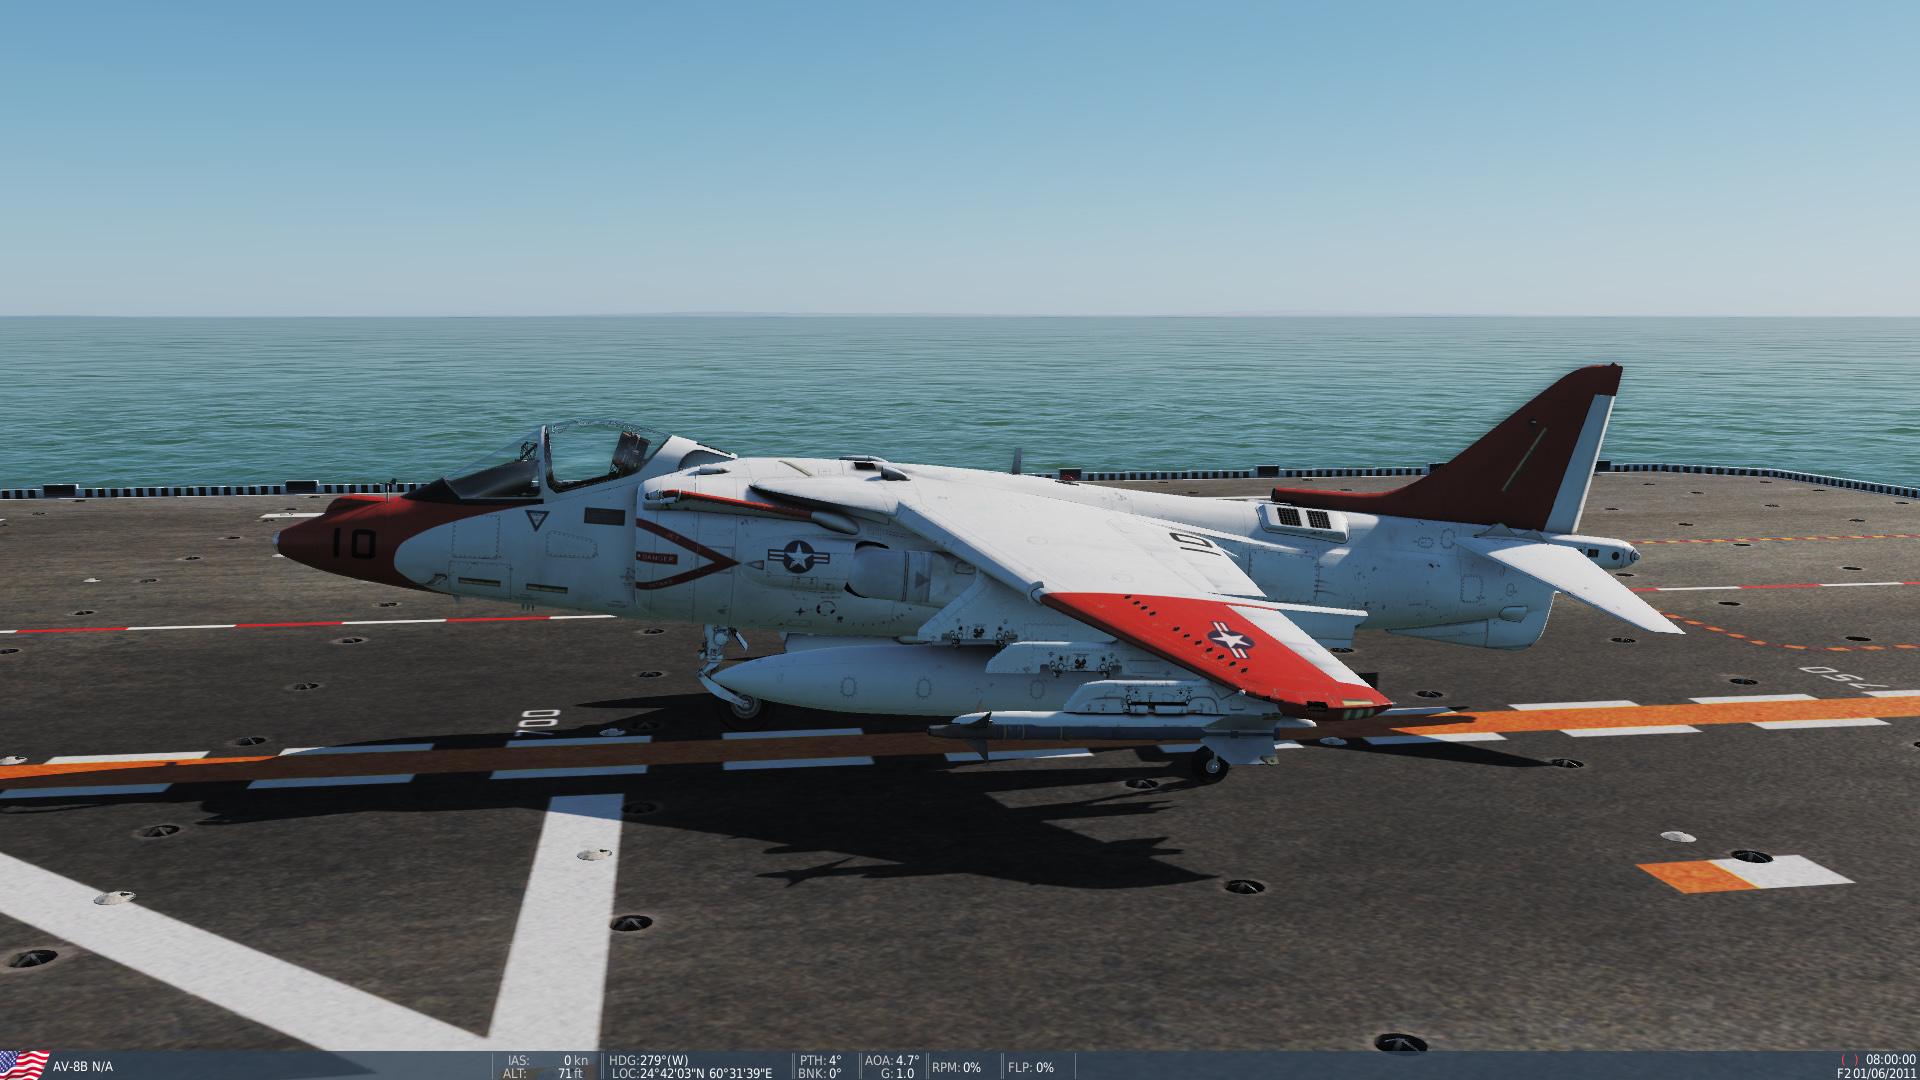 USN Harrier Traing Livery